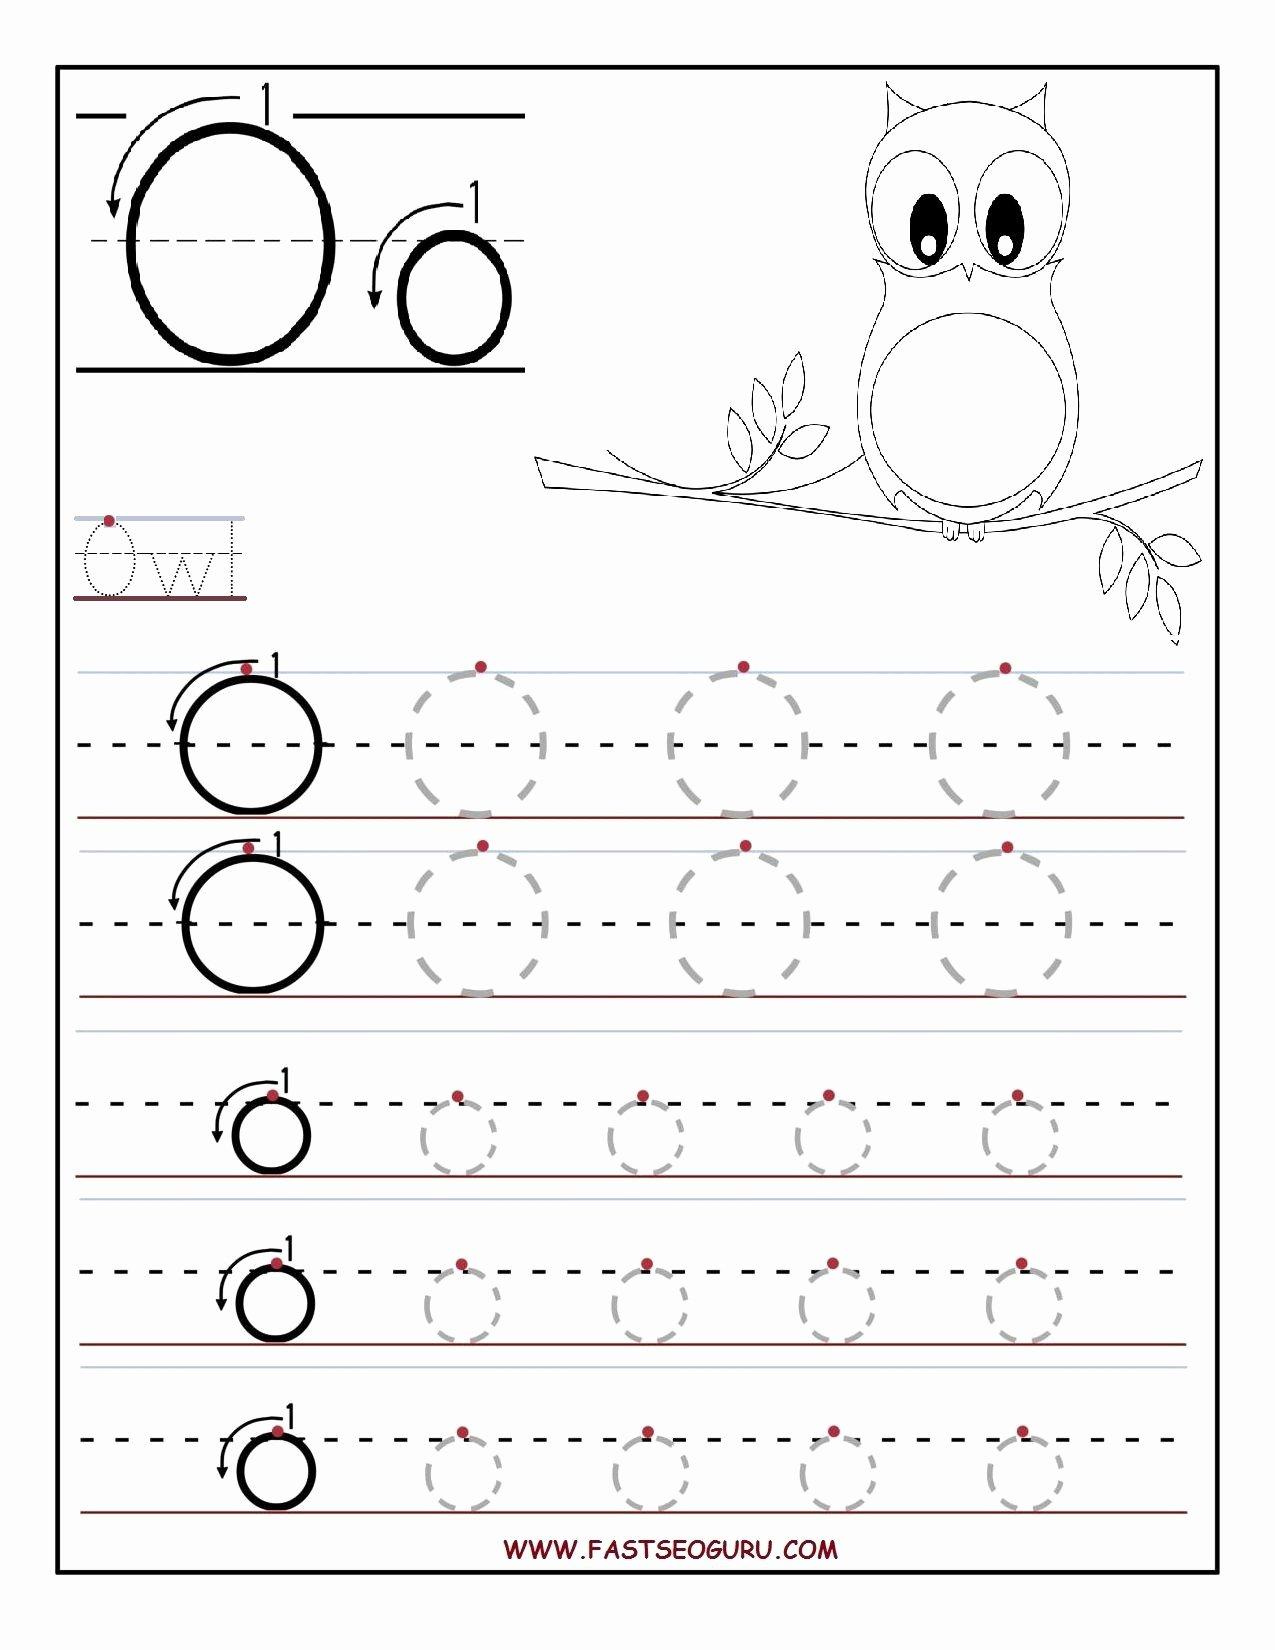 Letter O Worksheets for Preschool Kids Printable Letter O Tracing Worksheets for Preschool